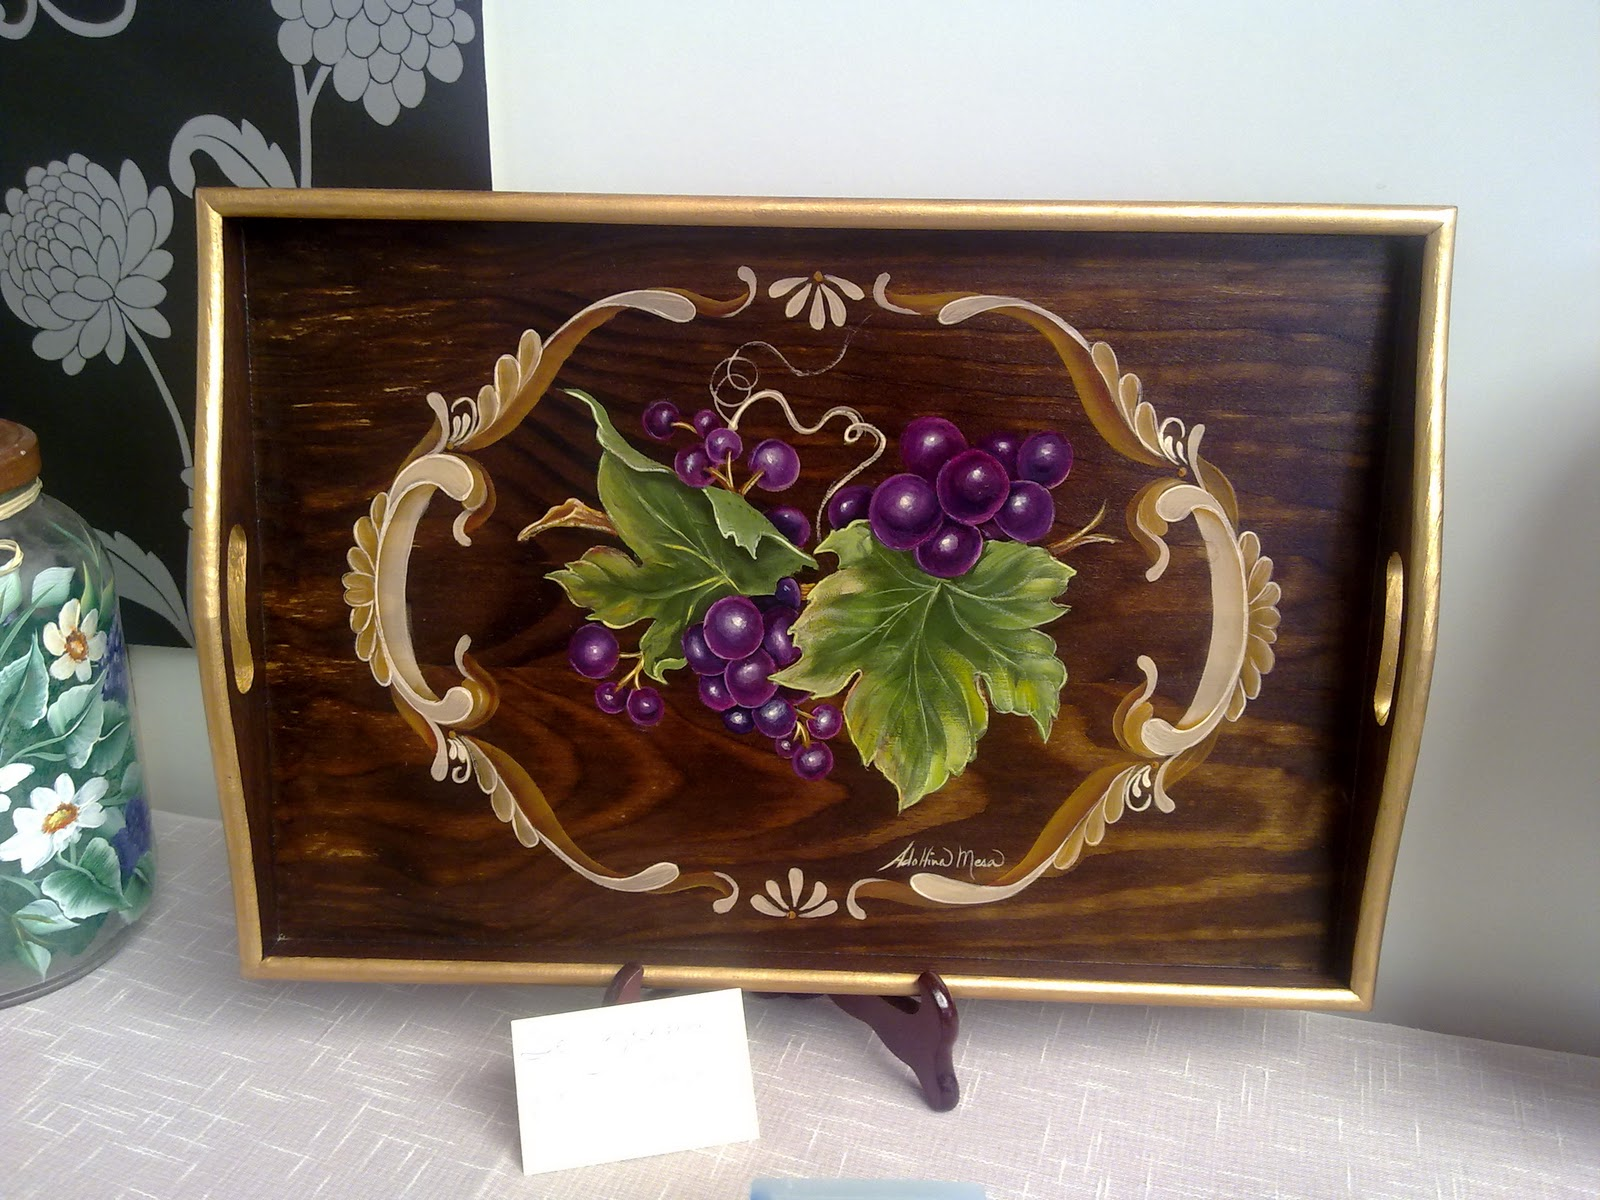 Adolfina mesa bandejas de madera decoradas y pintadas a mano for Bandejas de madera